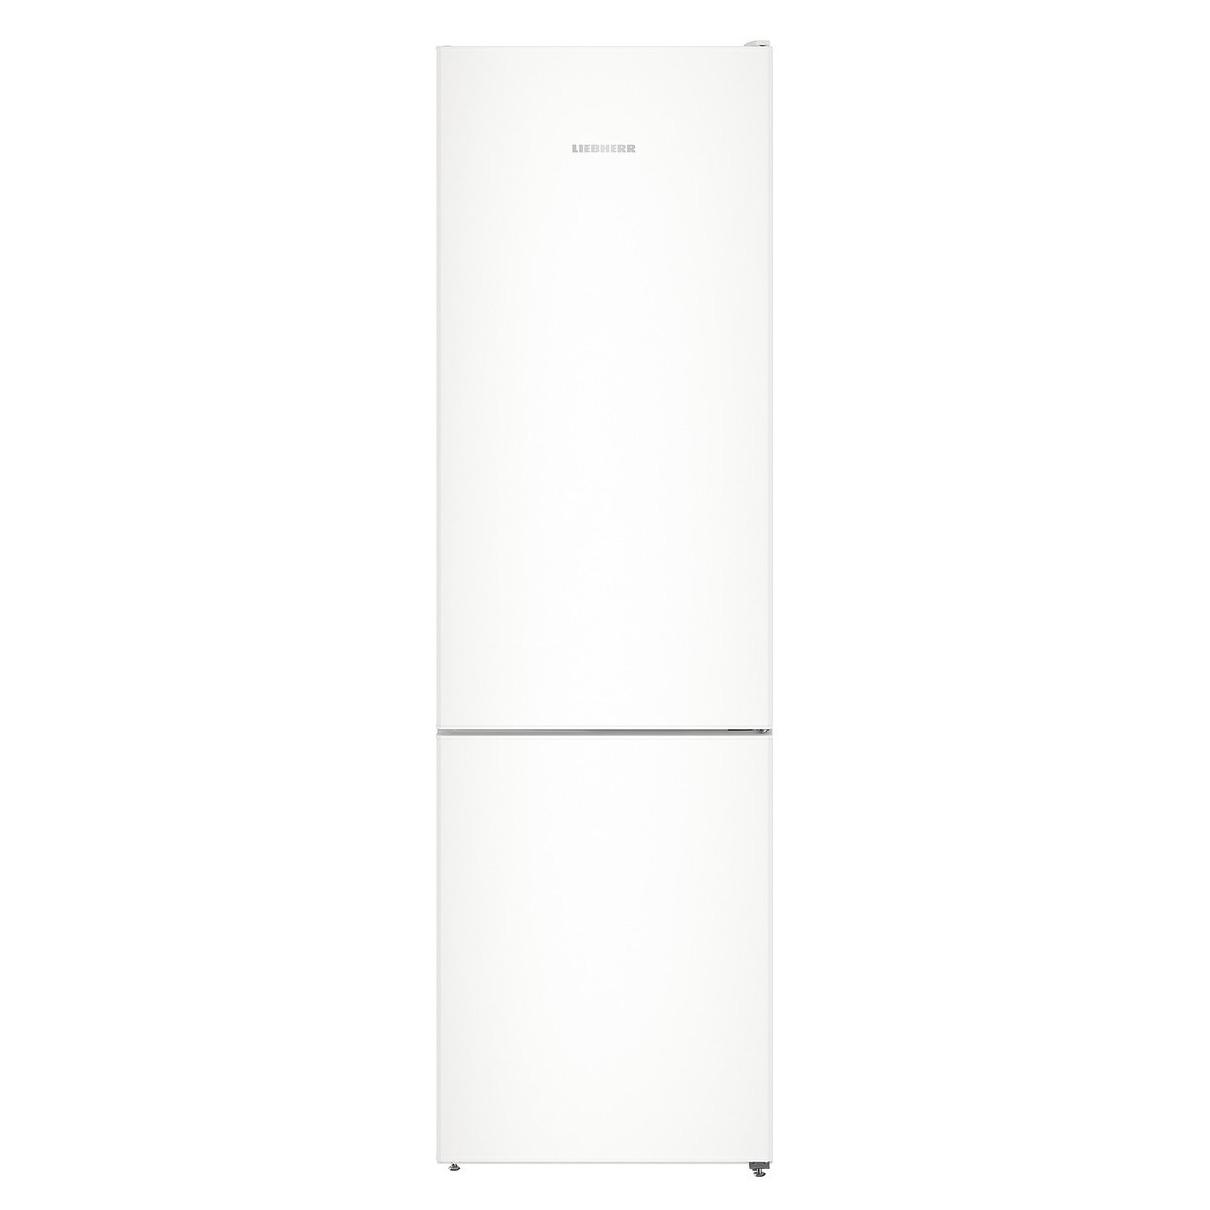 Liebherr koelkast met vriesvak CNP 4813-21 wit